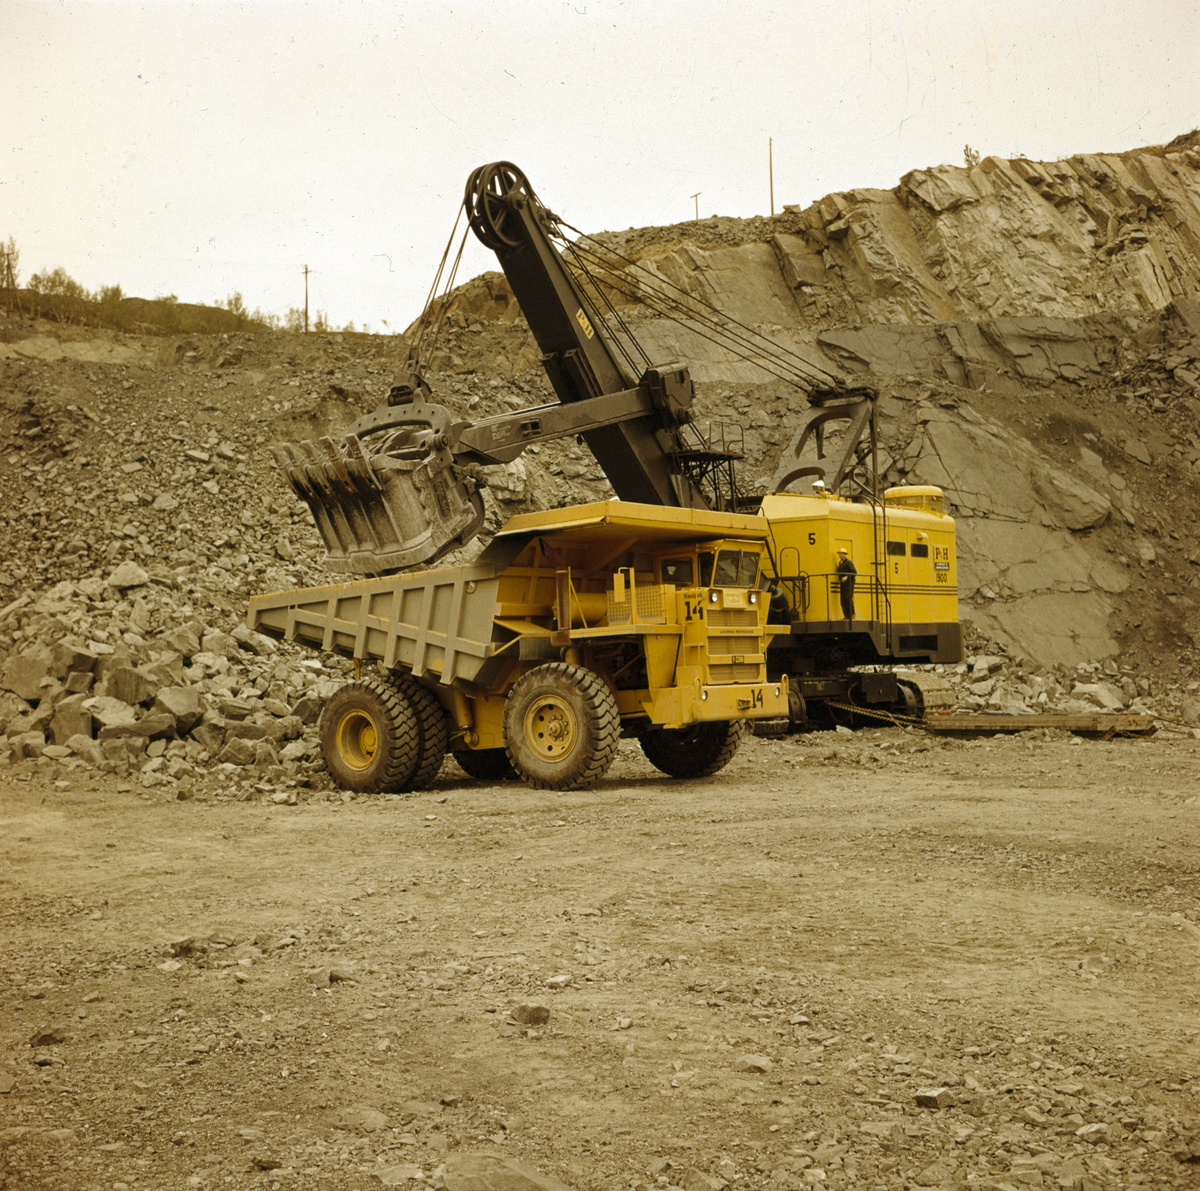 Foto av 60 tonns lastebil i arbeid...Fra fotografens originalemballasje:.60 Tonns lastebil.A/S Sydvaranger..Kirkenes.Aug 65.